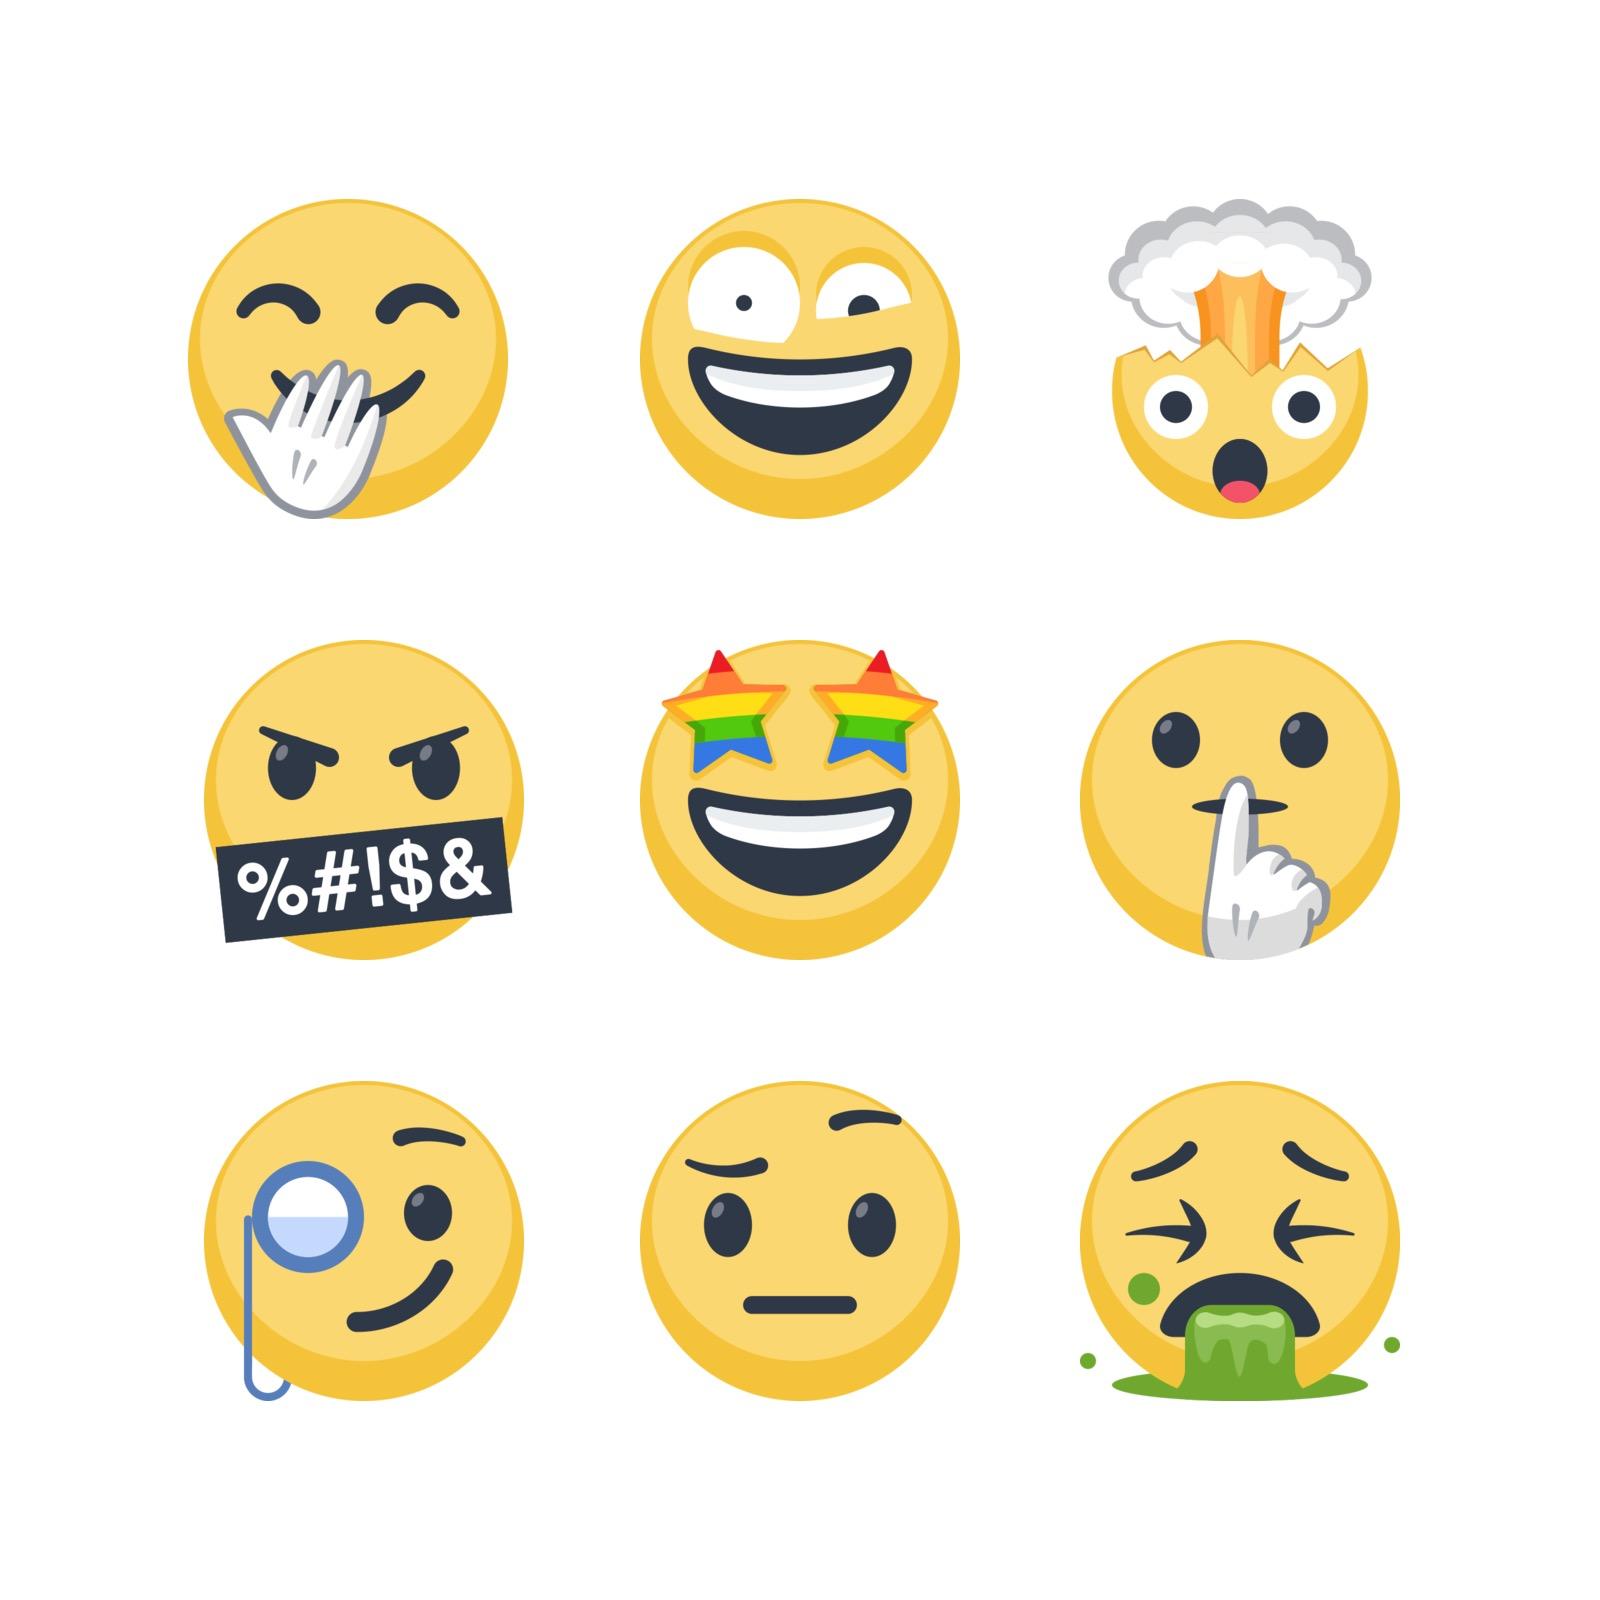 Facebook Releases New Emojis Levitating Woman